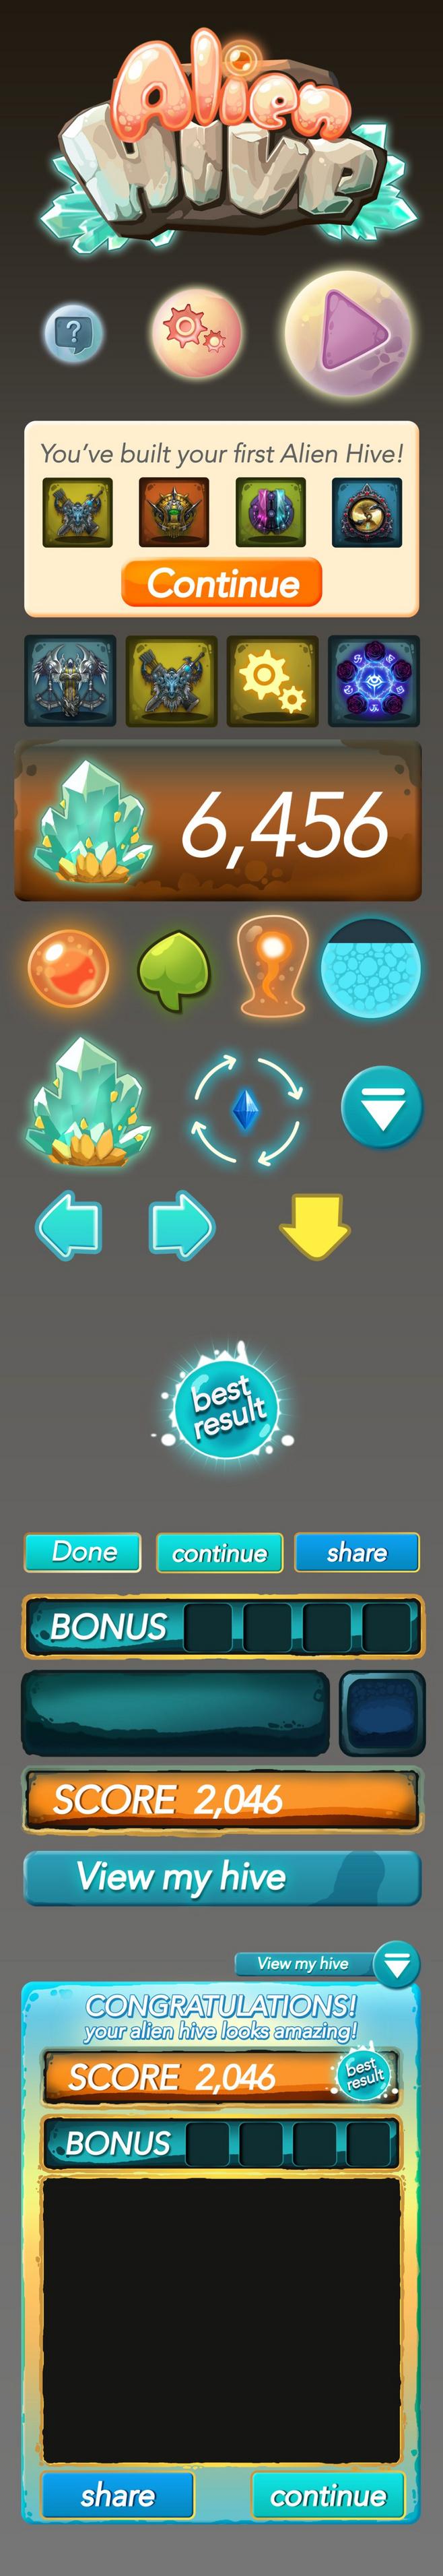 Some mobile game UI design